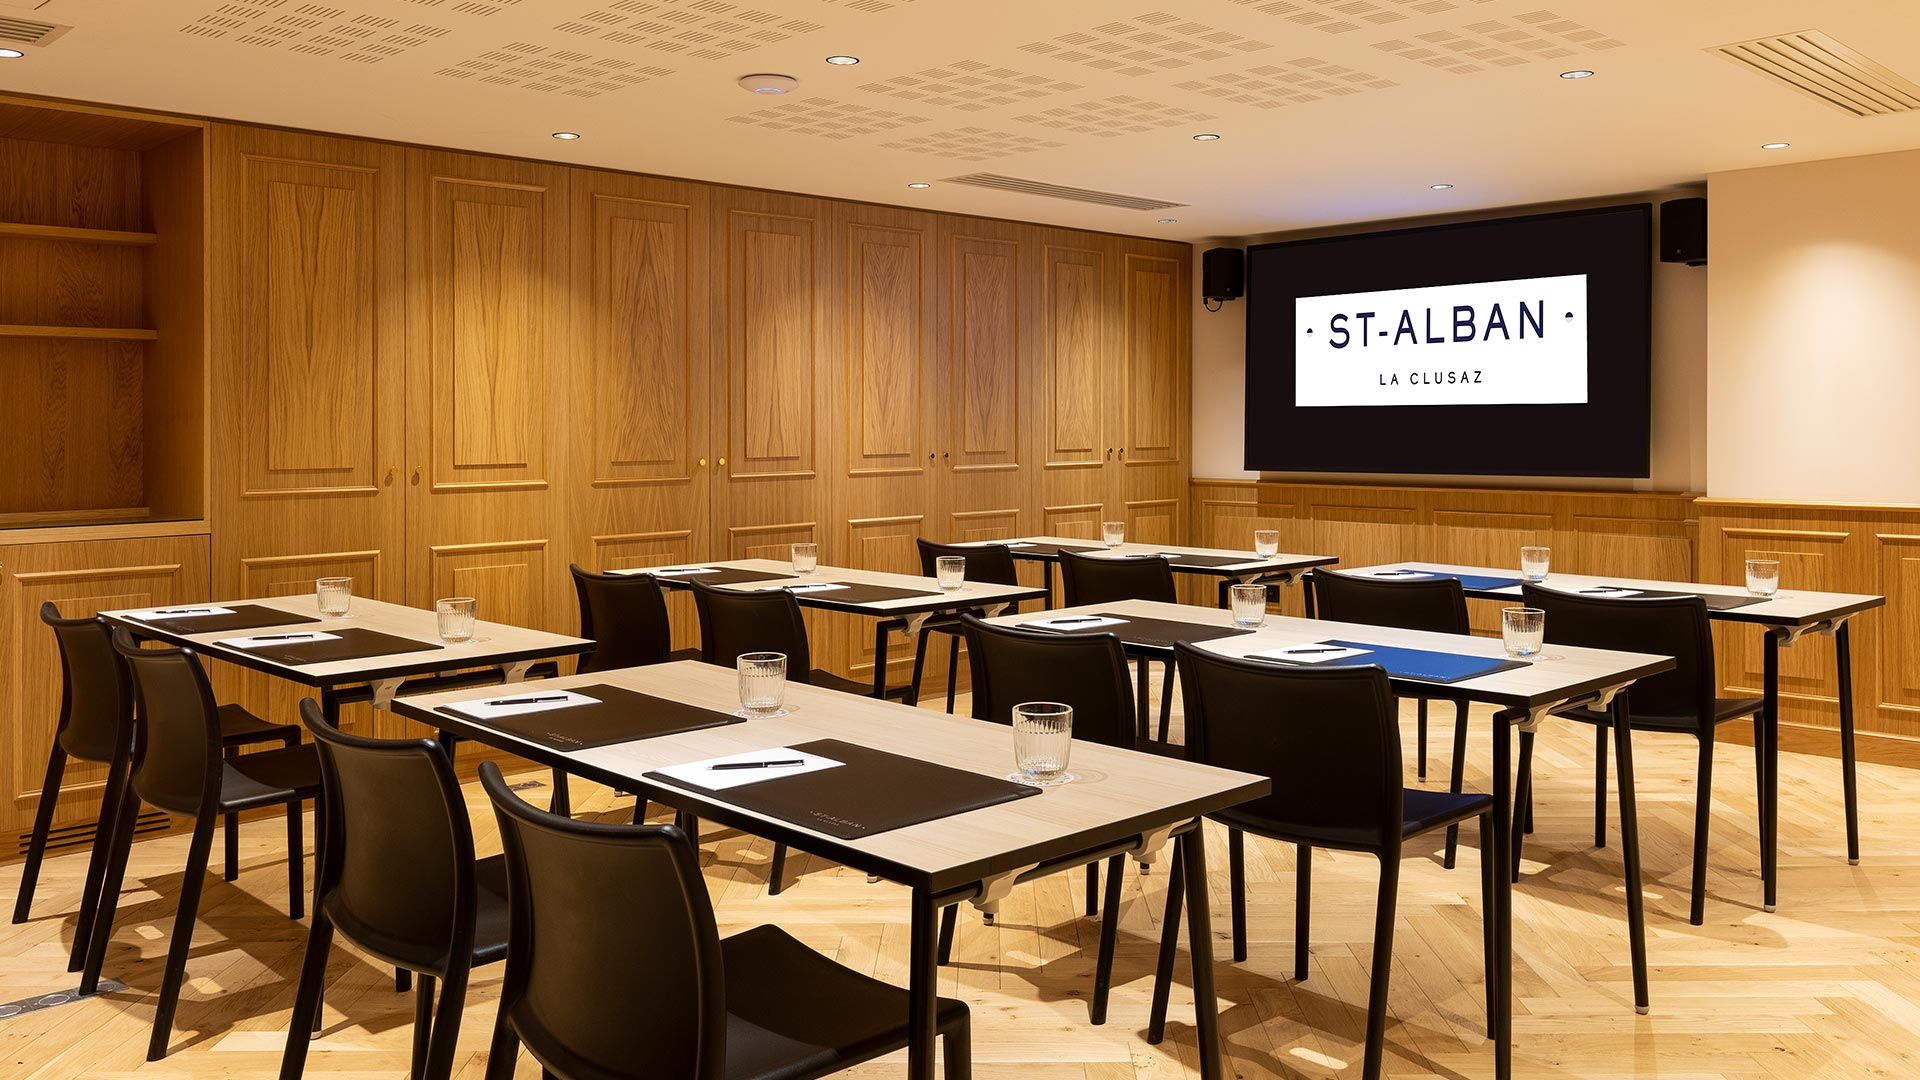 St-Alban Hotel & Spa - Salle de classe